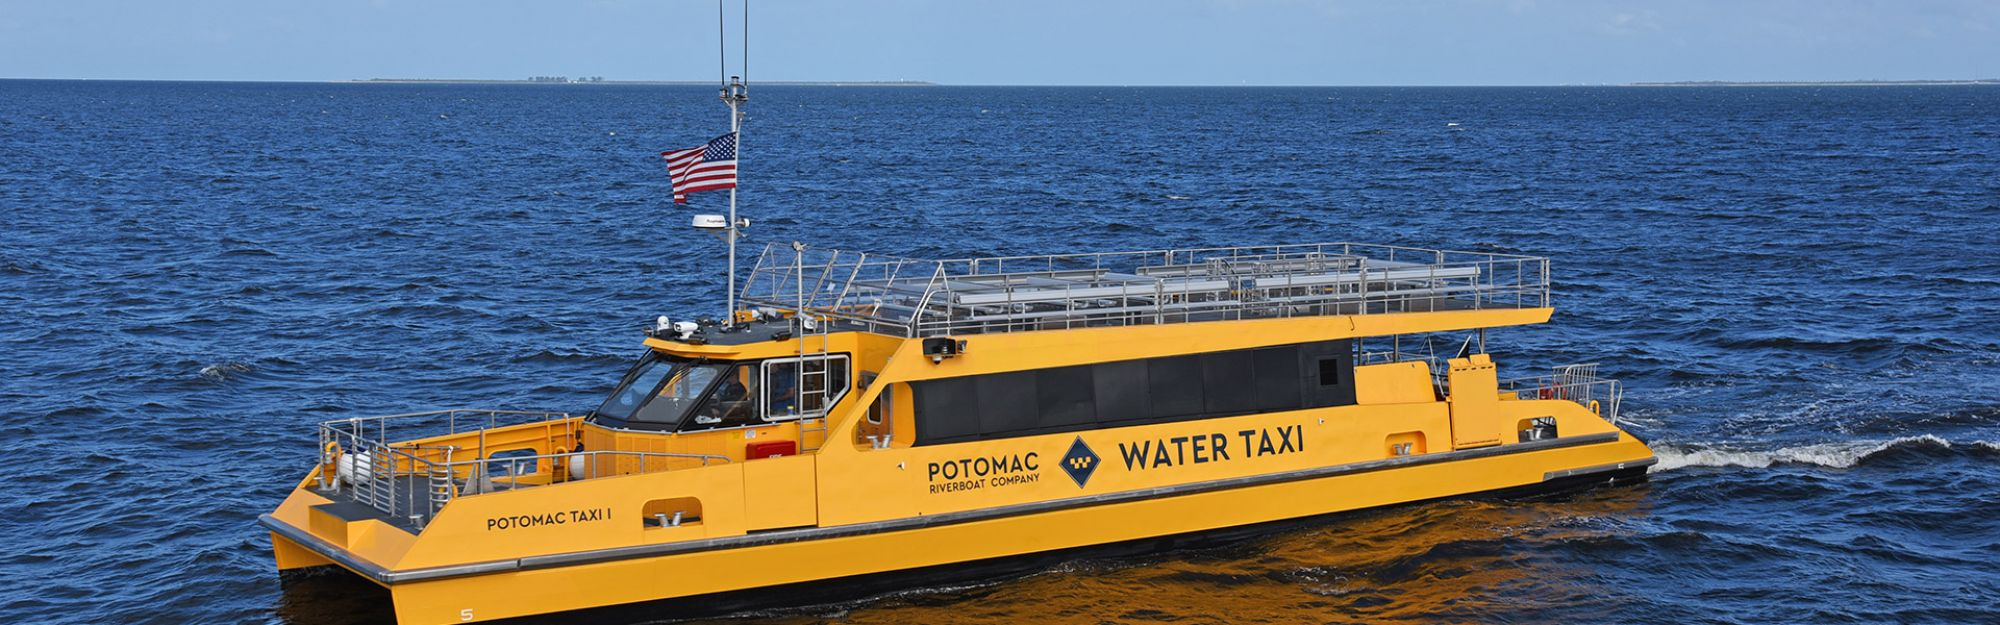 Washington DC Deluxe Ticket + Wharf Boat Cruise